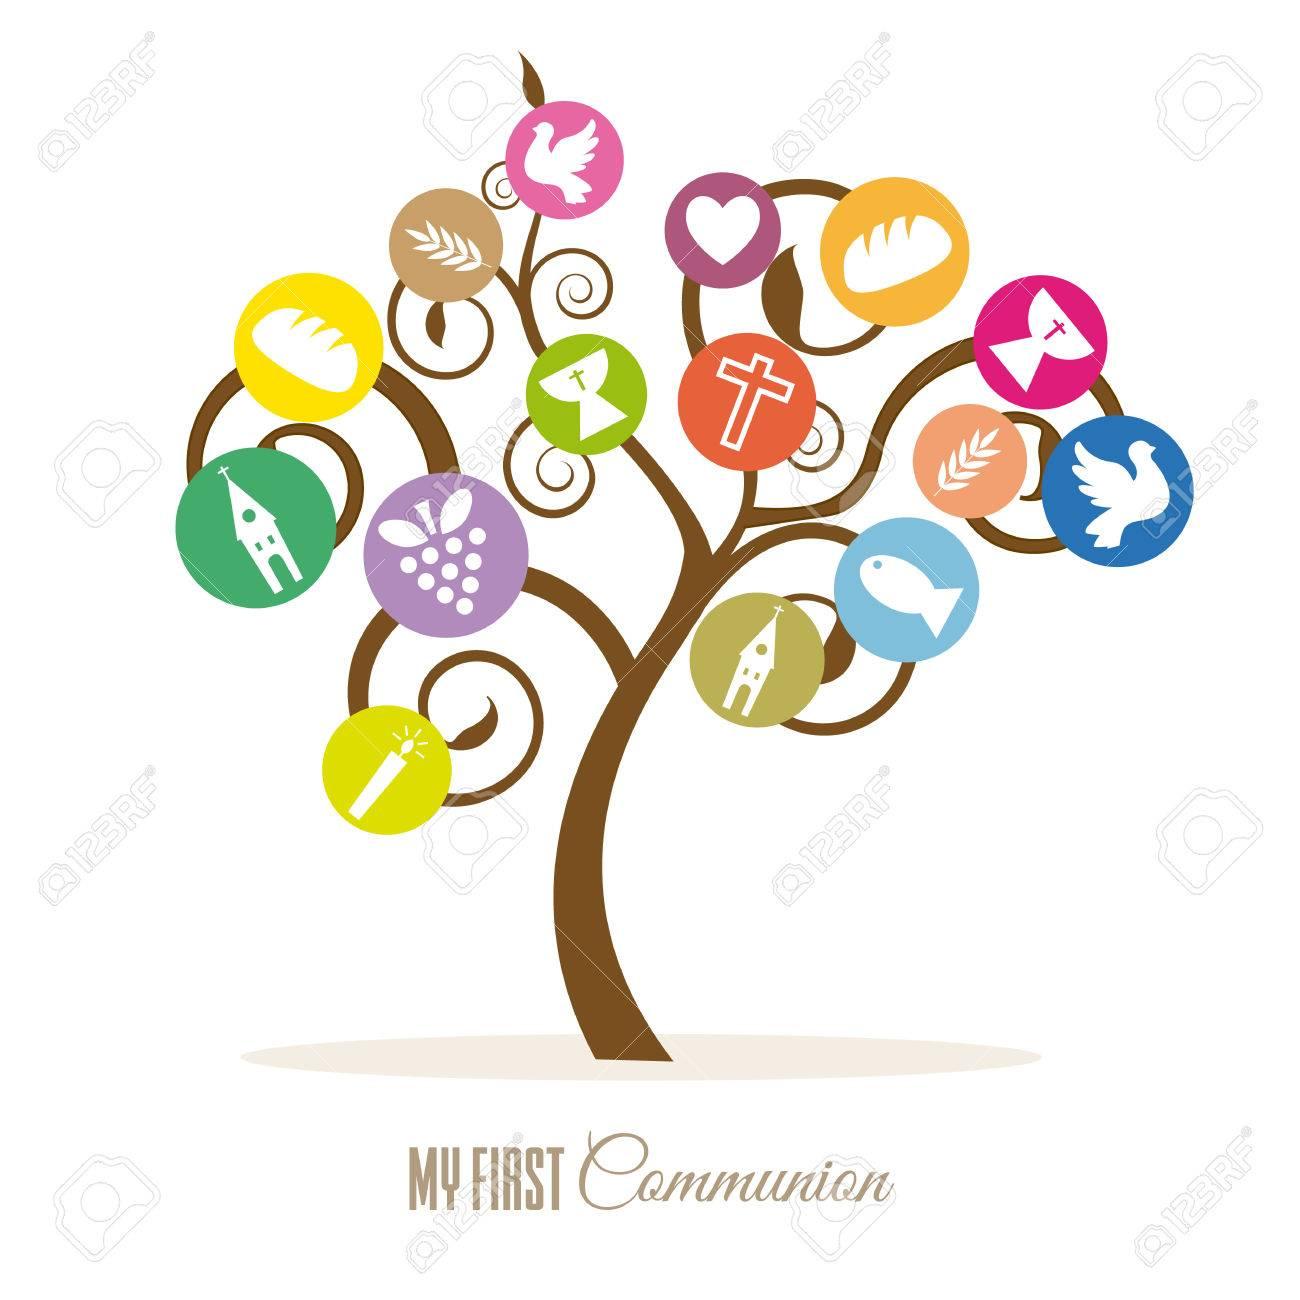 Communion invitation tree religious icons royalty free cliparts communion invitation tree religious icons stock vector 75847371 stopboris Image collections